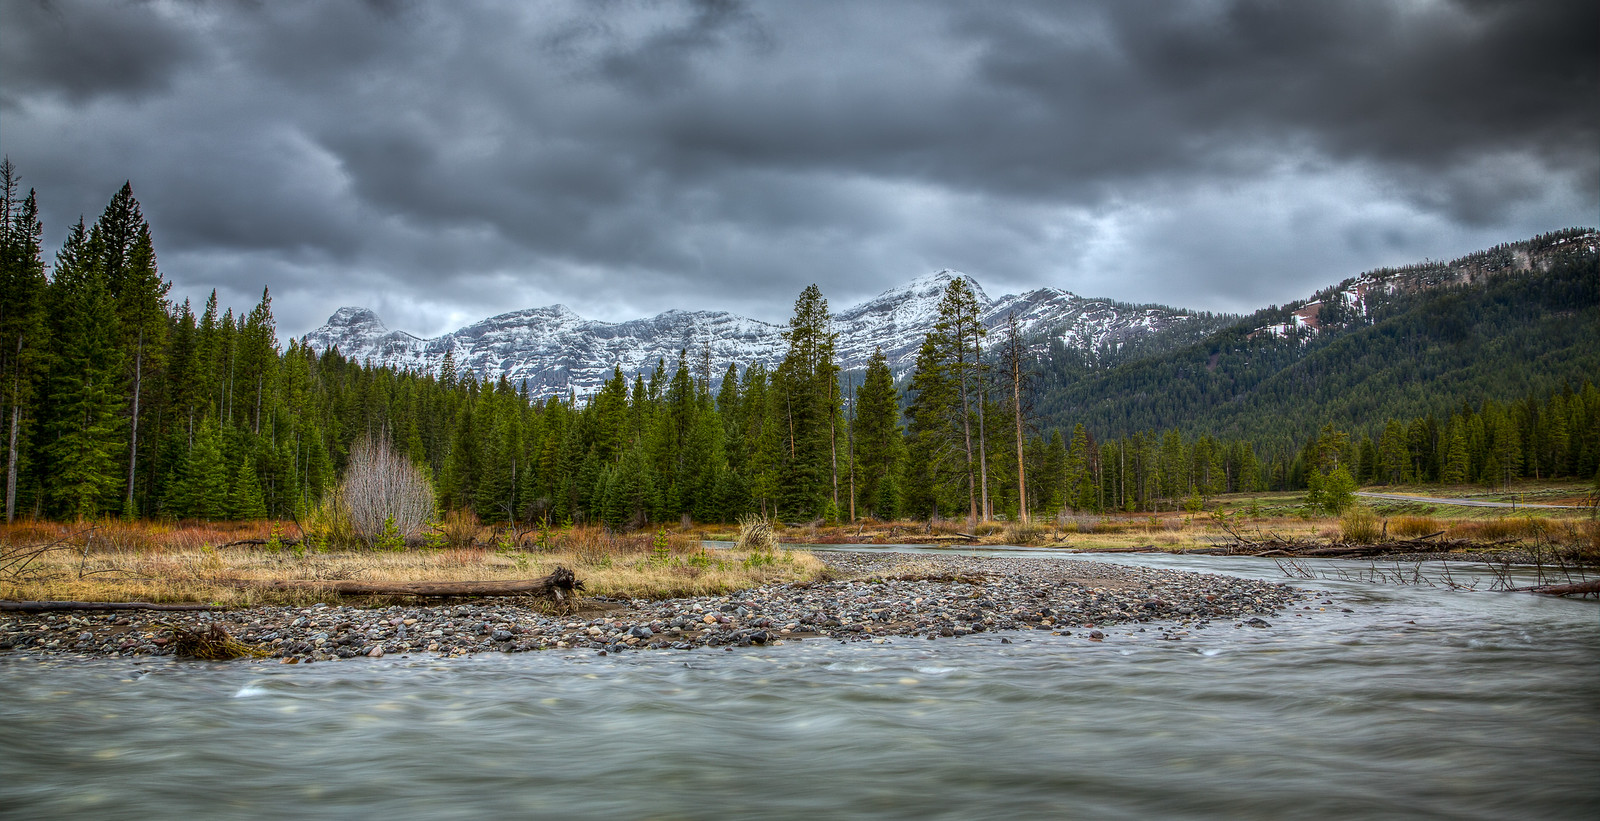 Pebble Creek - Yellowstone National Park